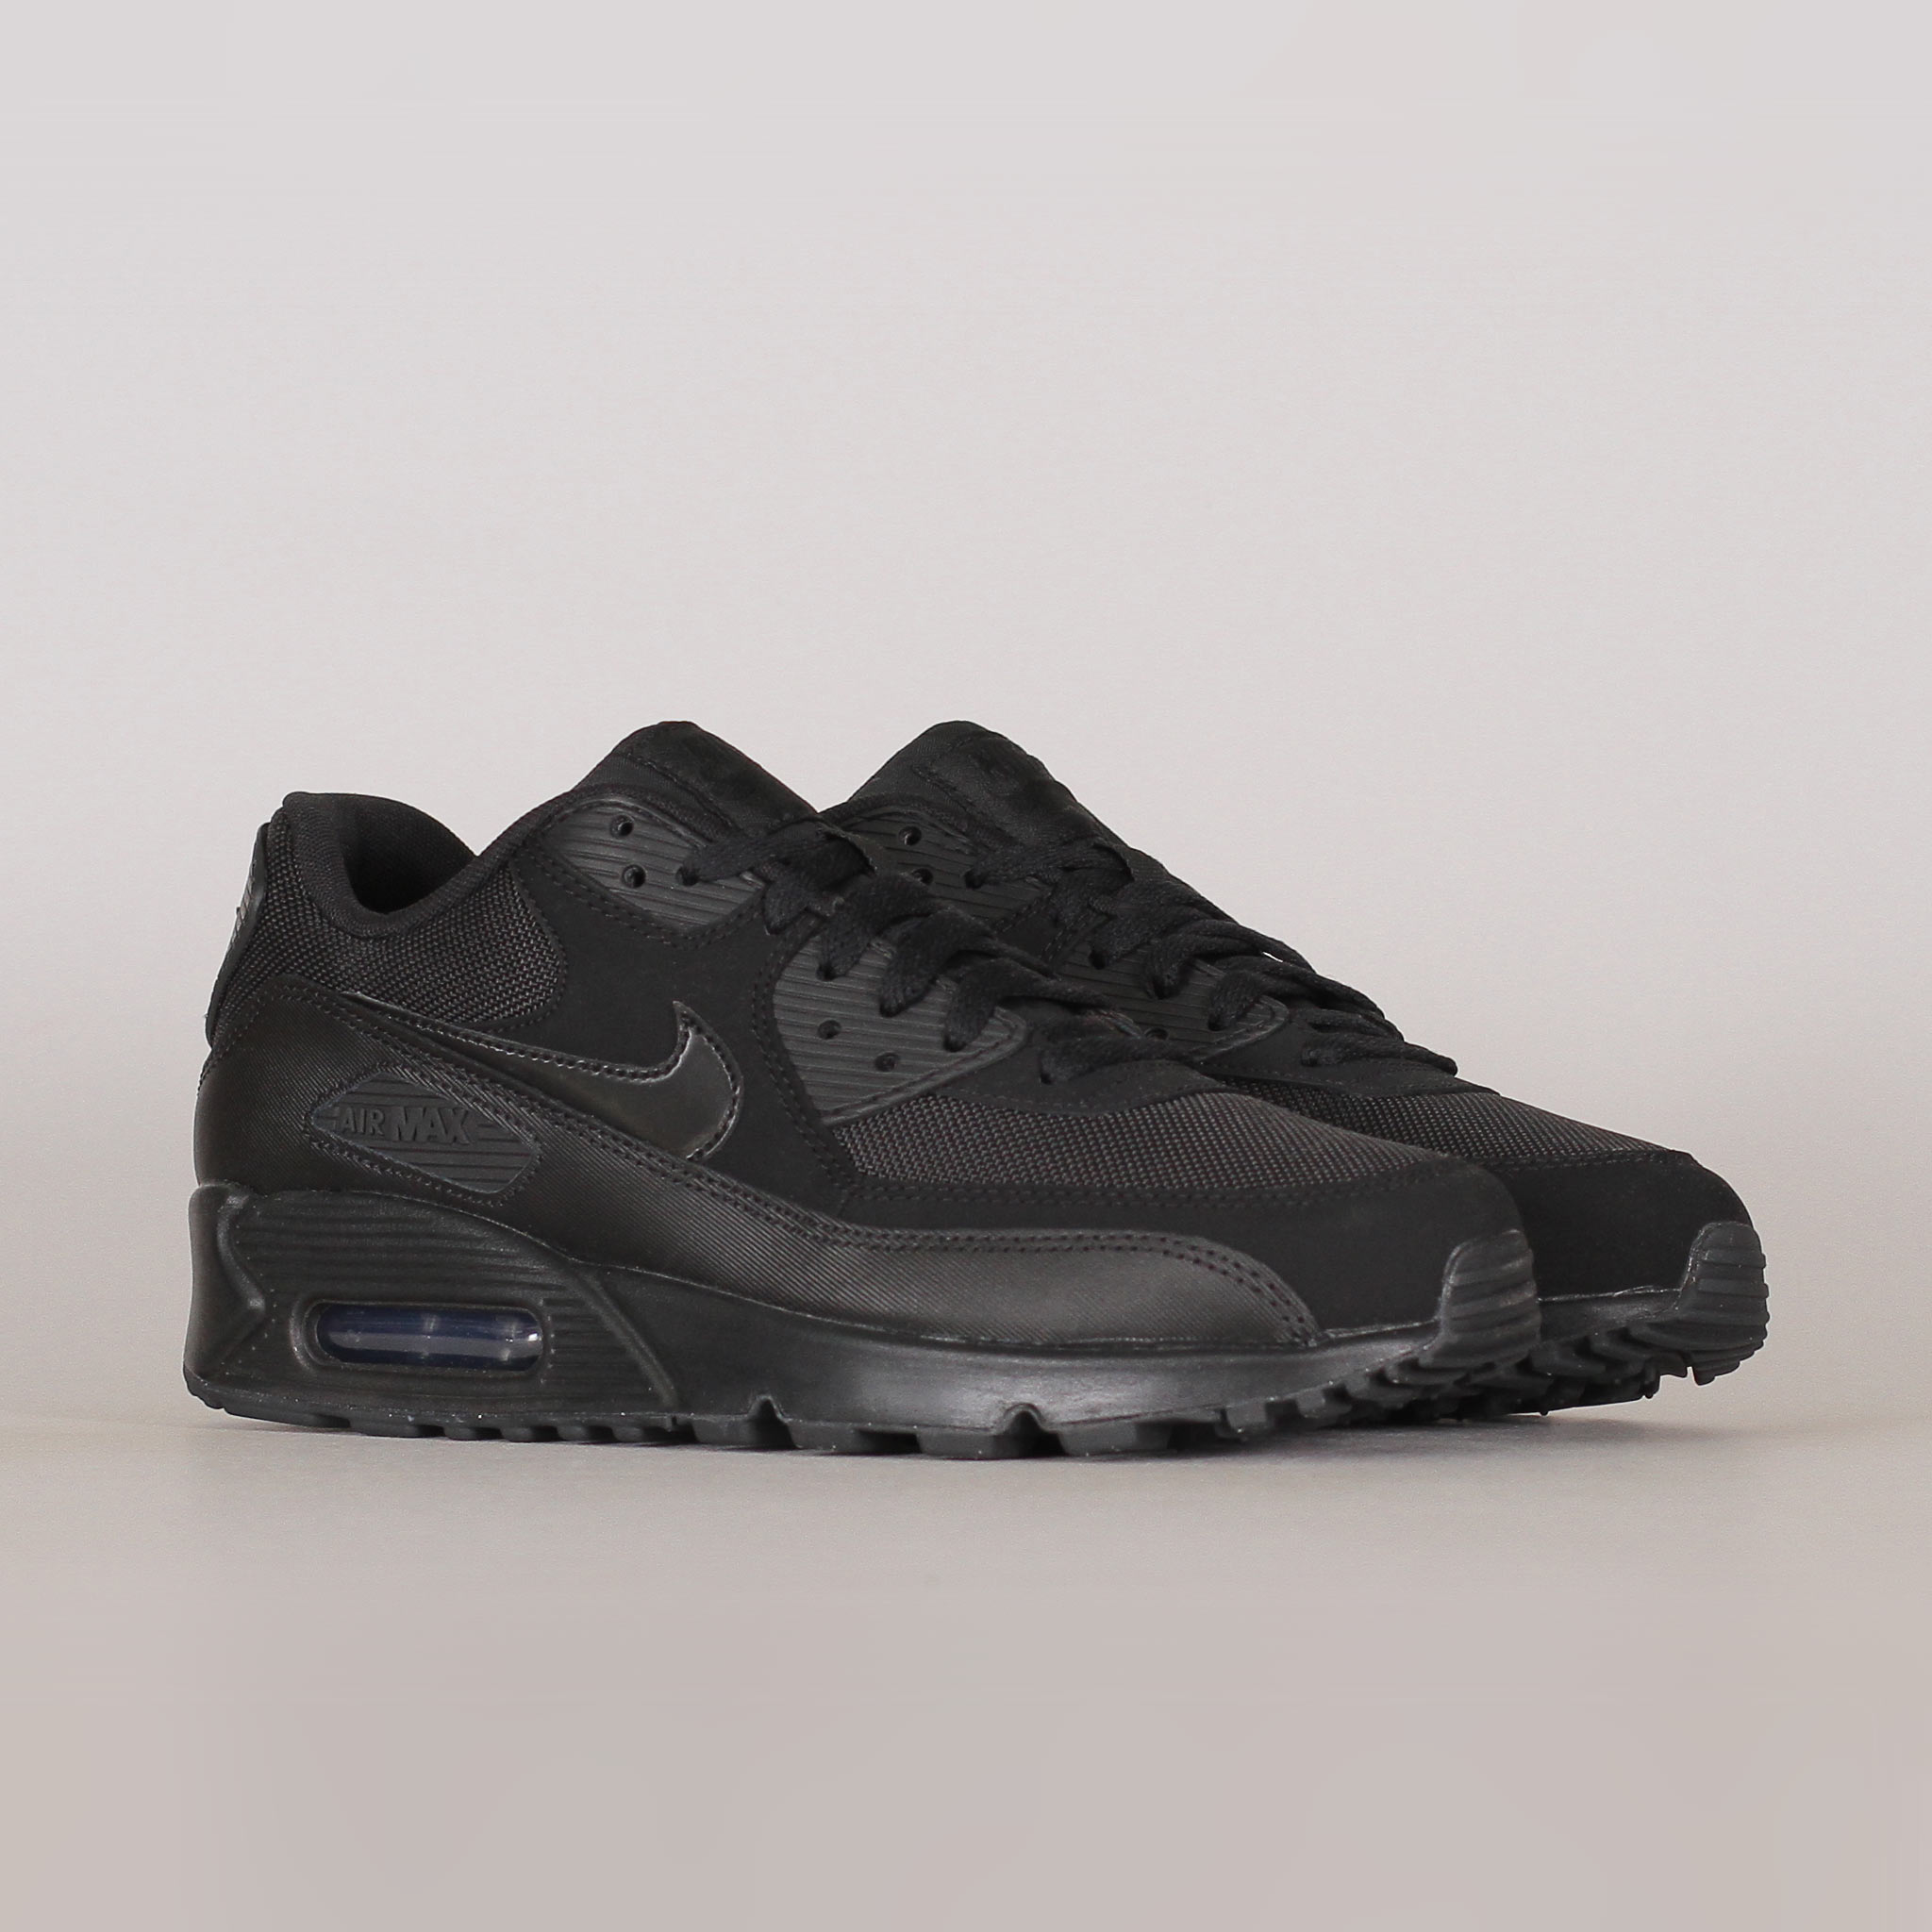 Nike Sportswear Air Max 90 Essential (537384 090)